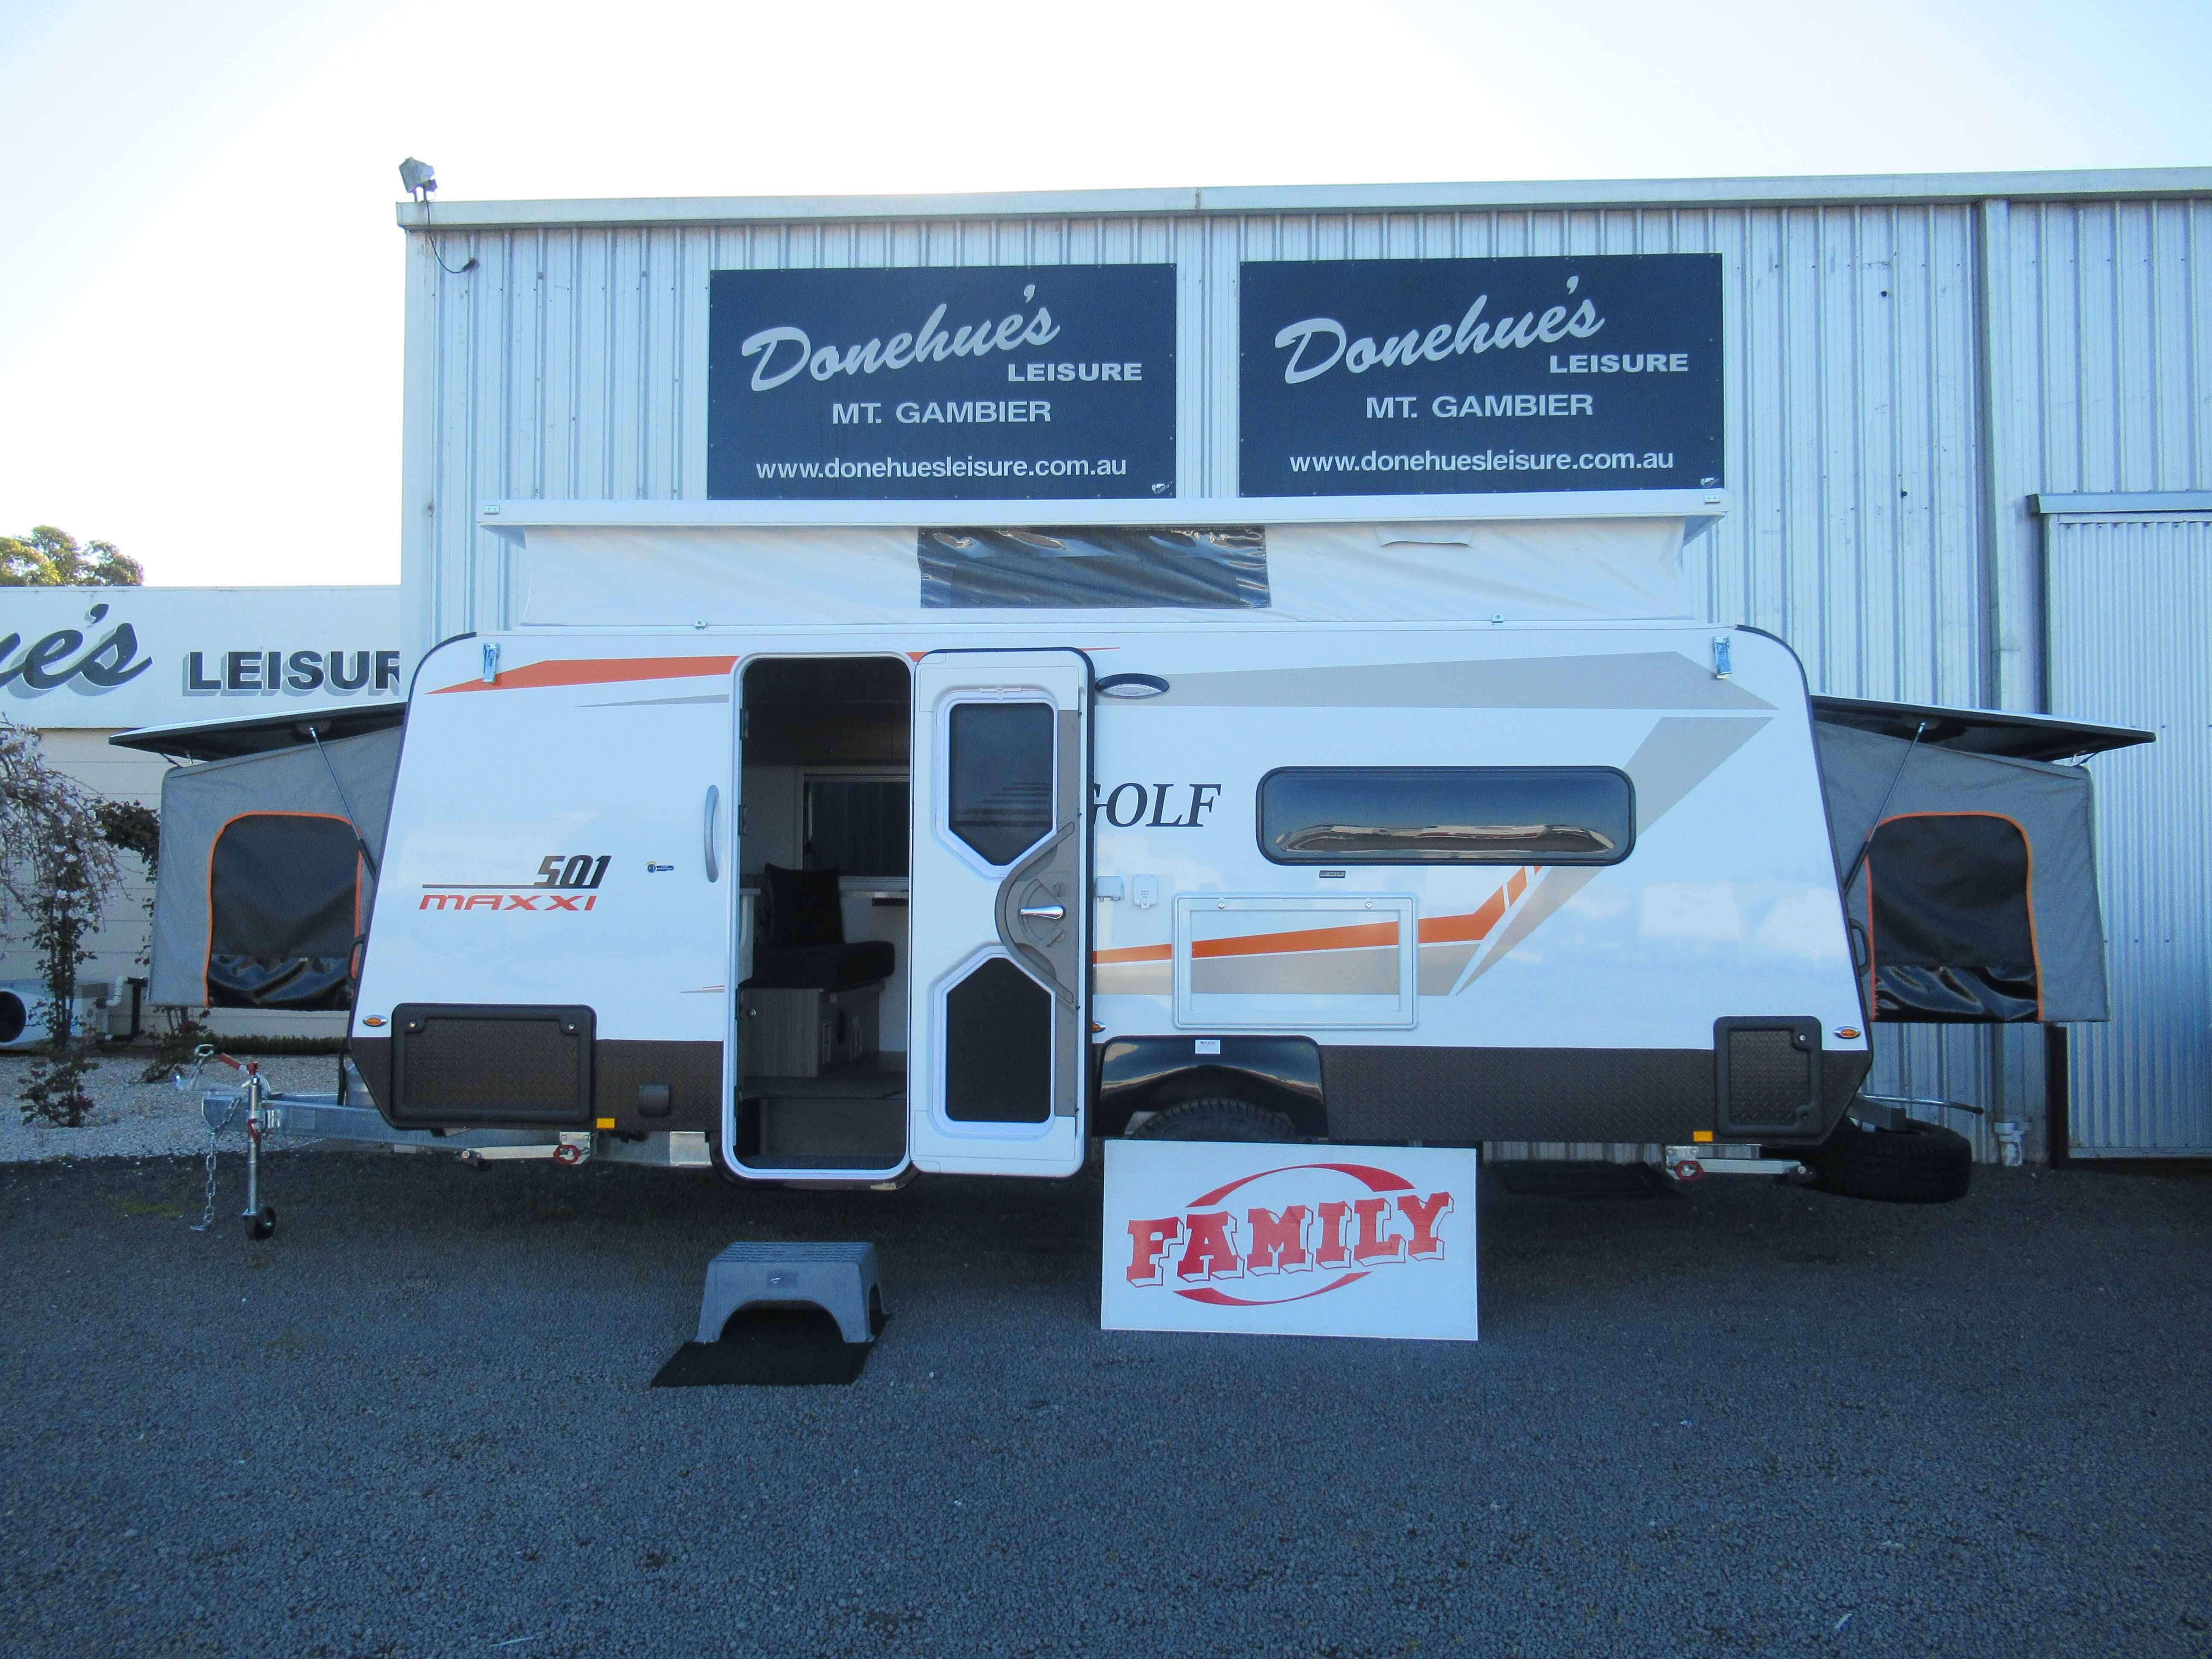 Donehues Leisure New Golf Maxxi 501 3 Family Bunk Poptop Caravan Mt Gambier 12358 19